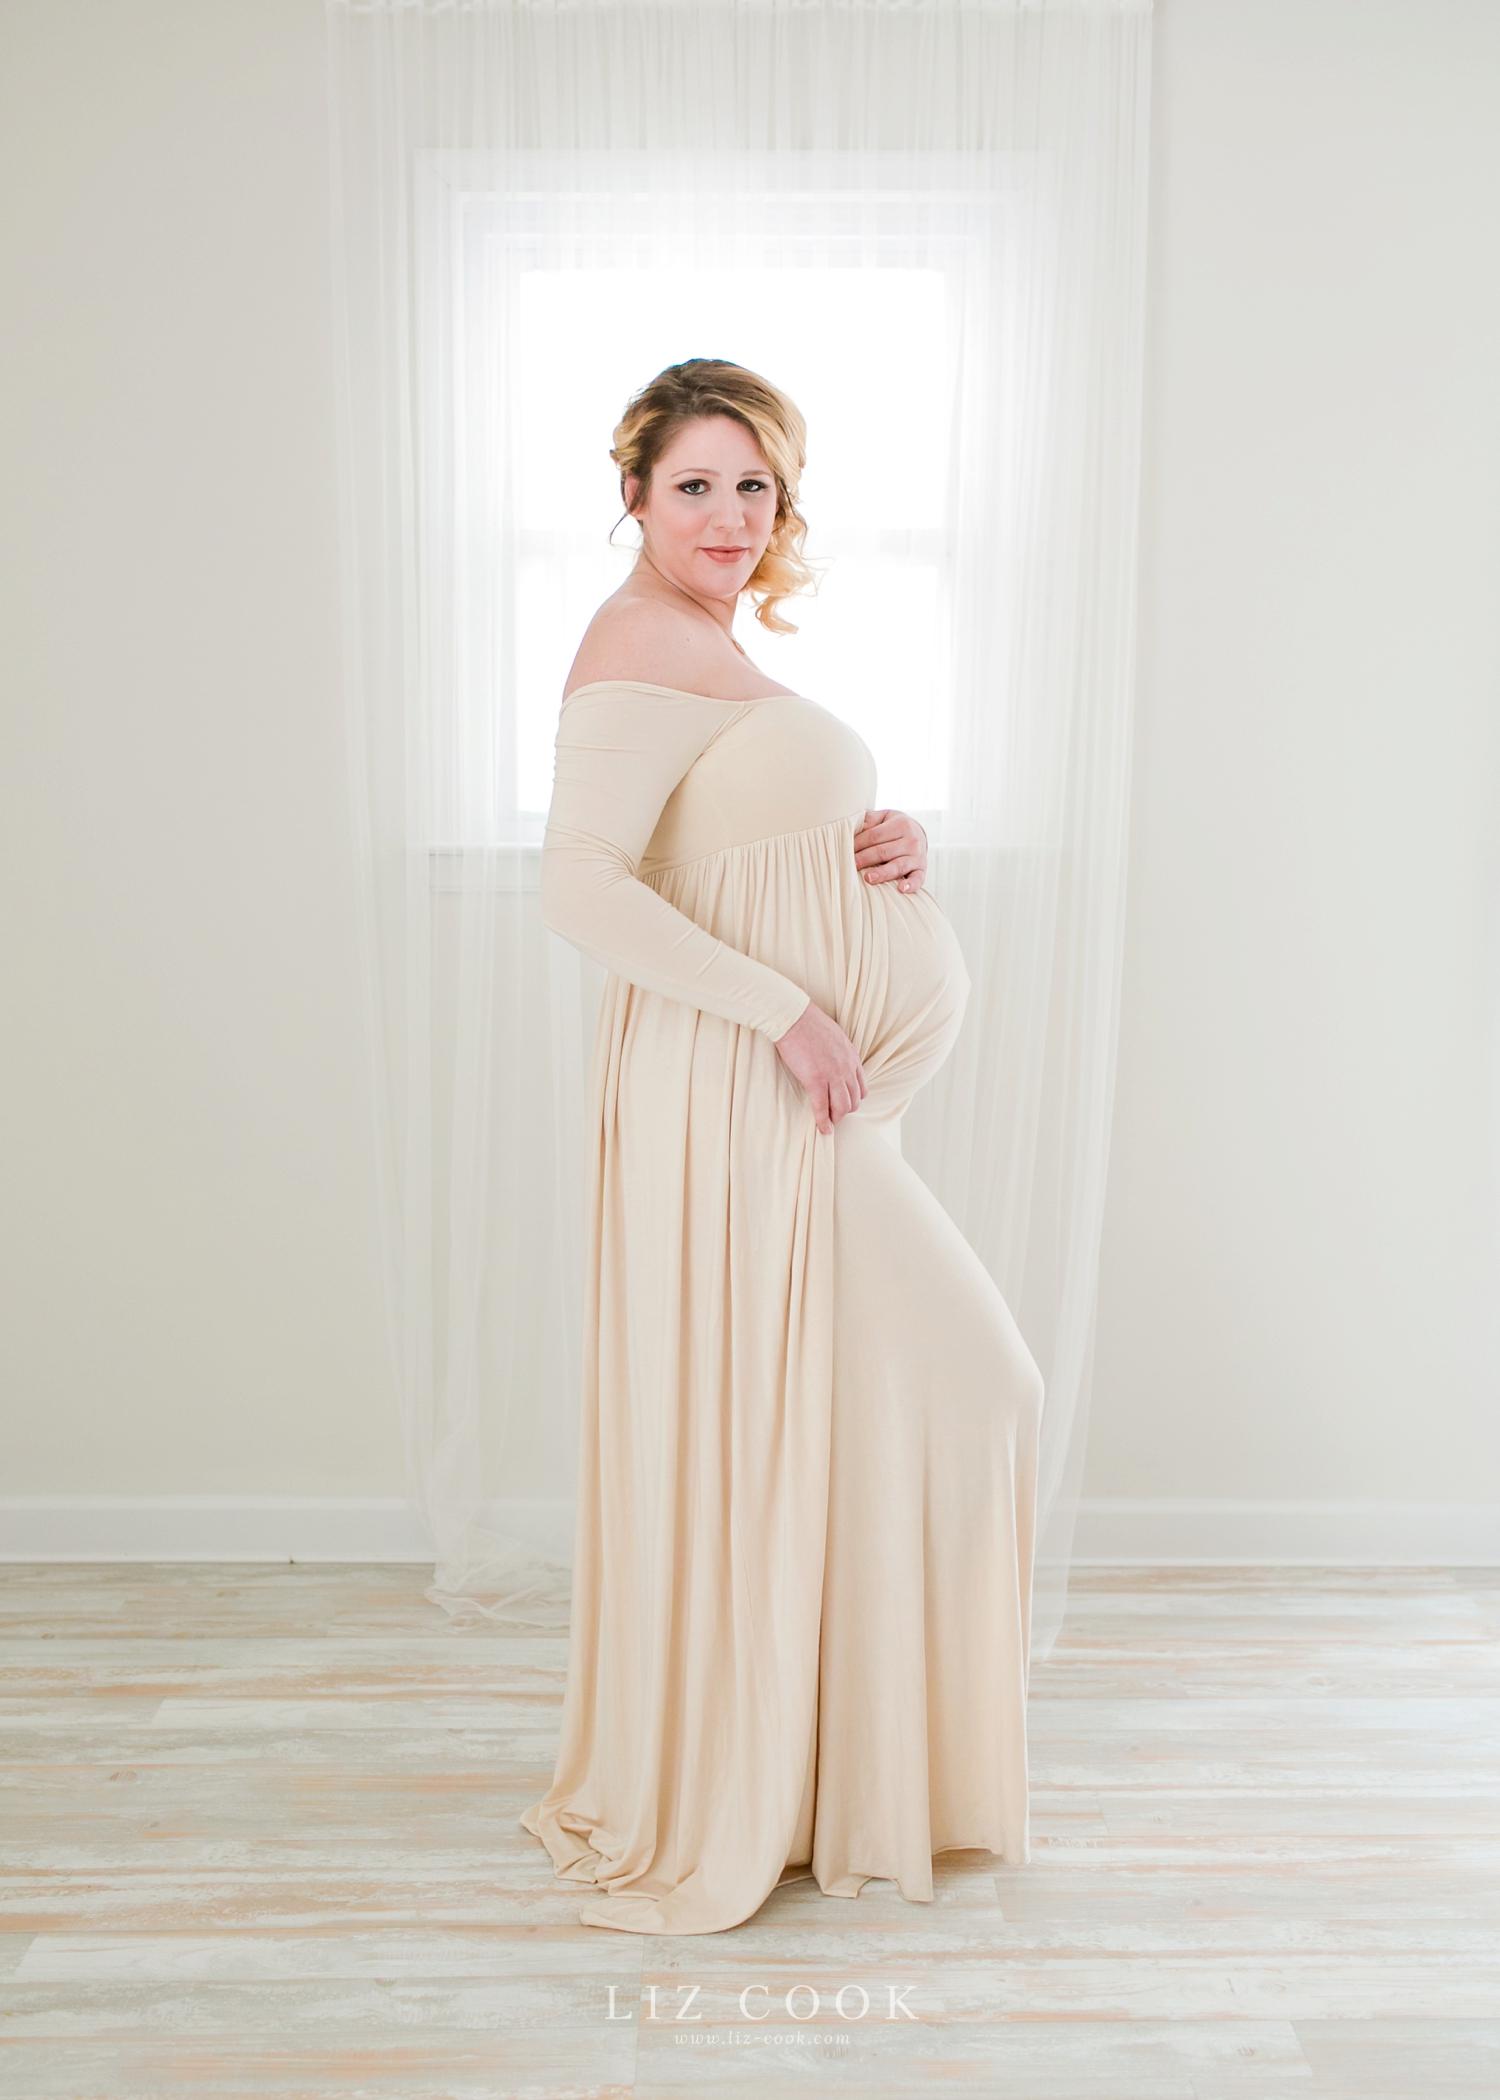 lynchburg_maternity_photographer_0004.jpg